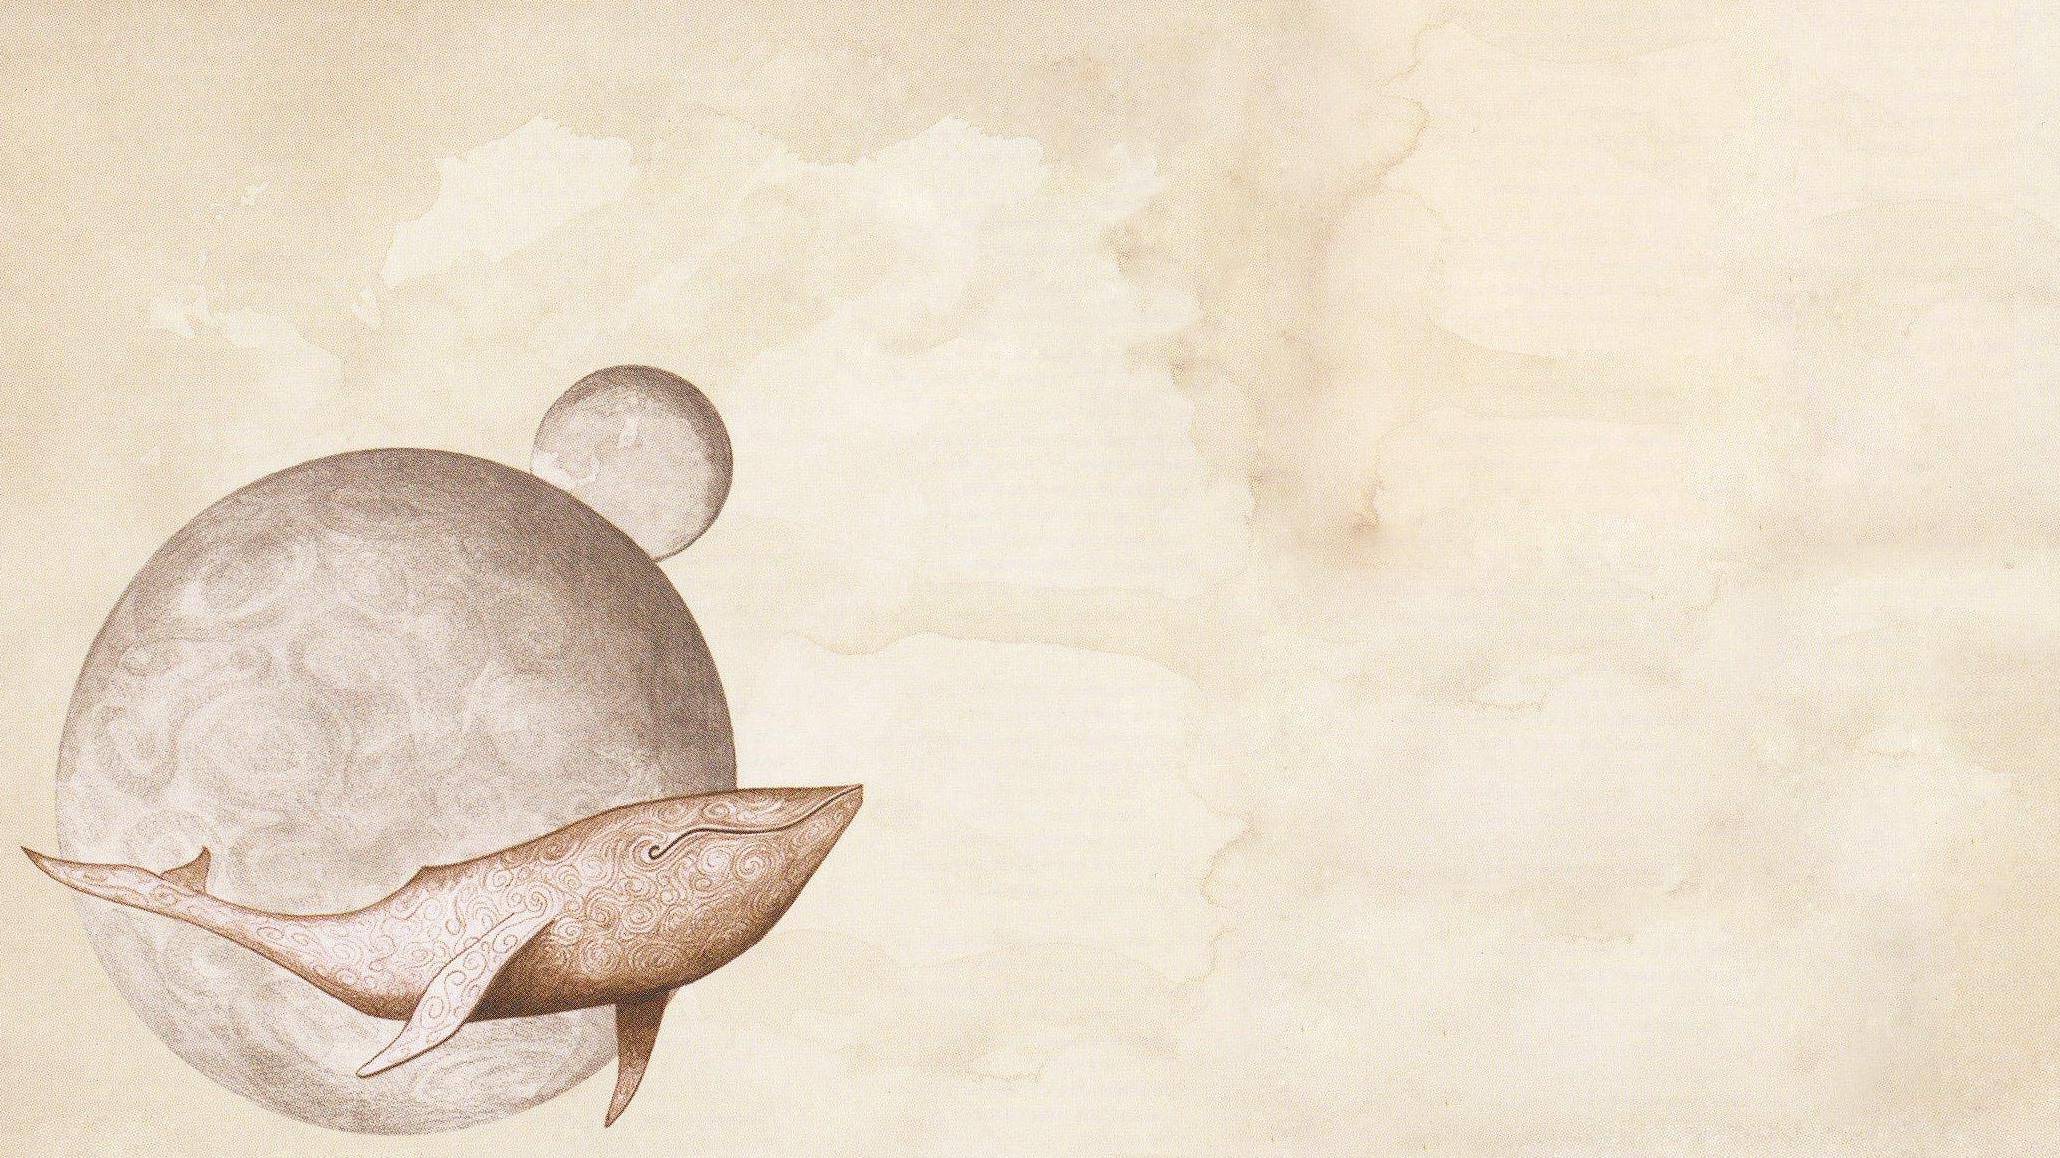 Gojira Wallpaper 76 images 2060x1158